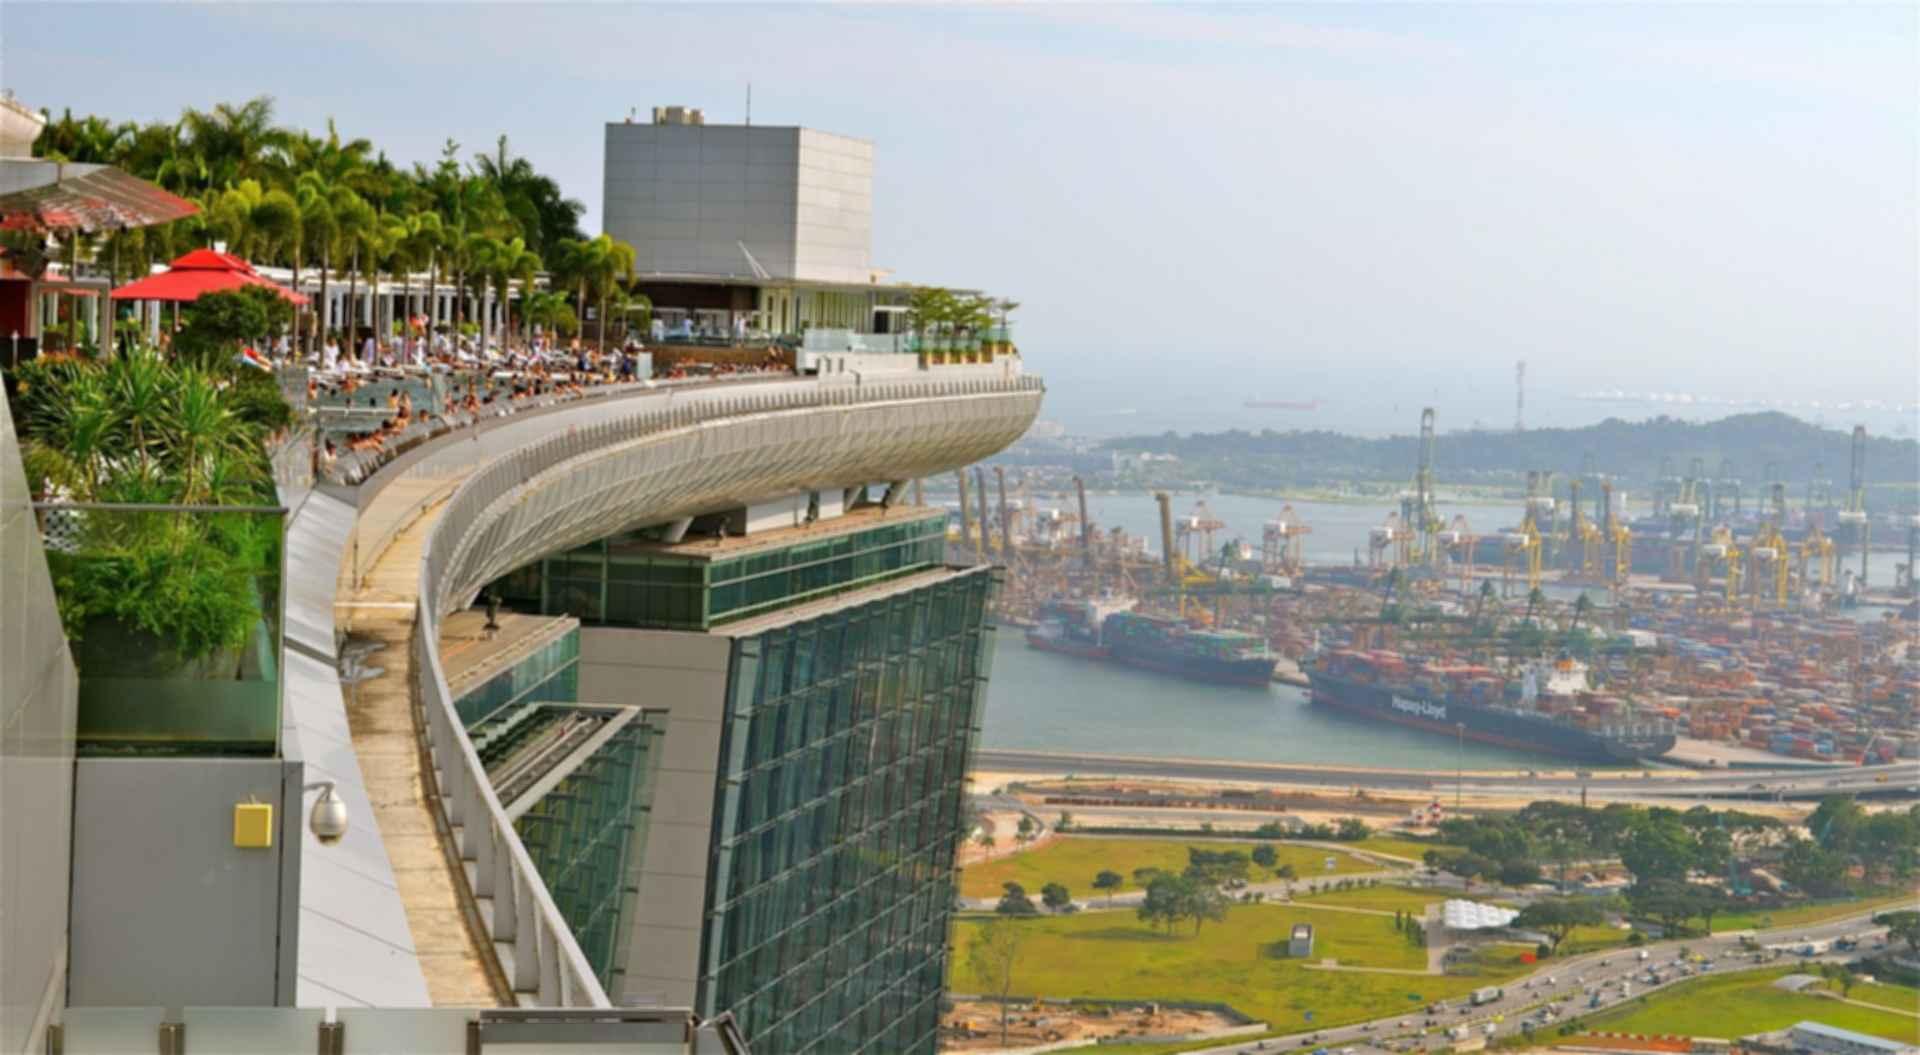 Marina Bay Sands - SkyPark View